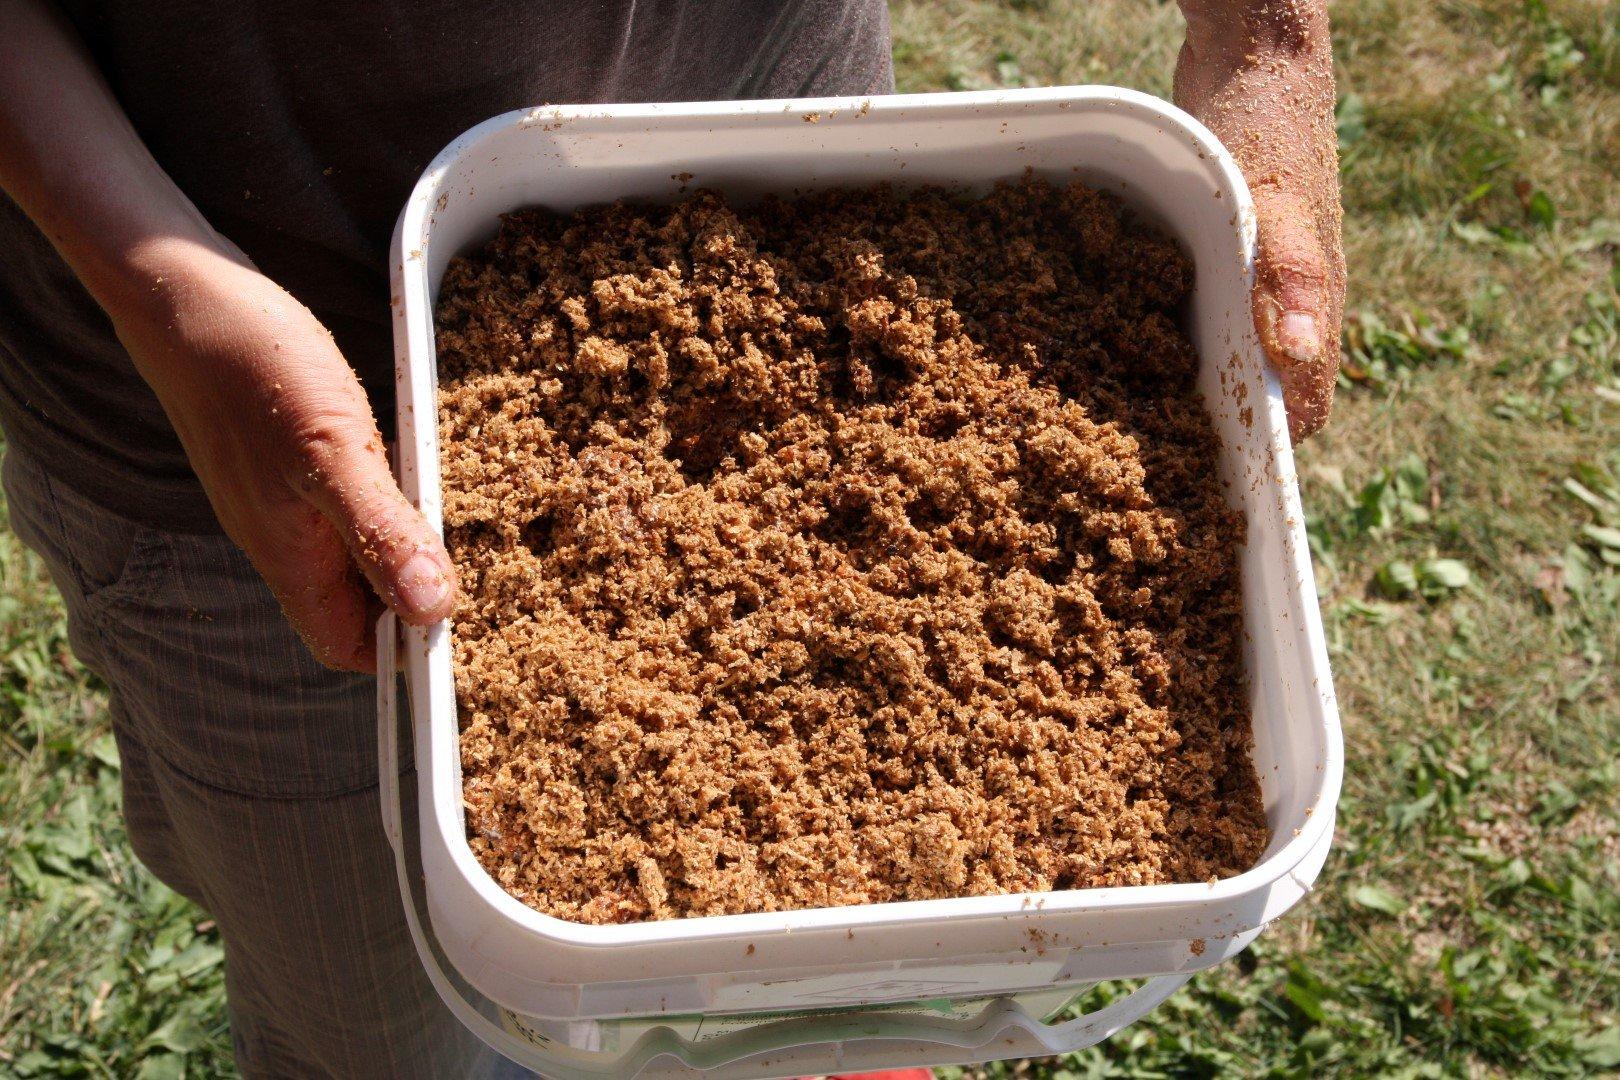 Sawdust buckets | Canadian culinary and medicinal mushroom